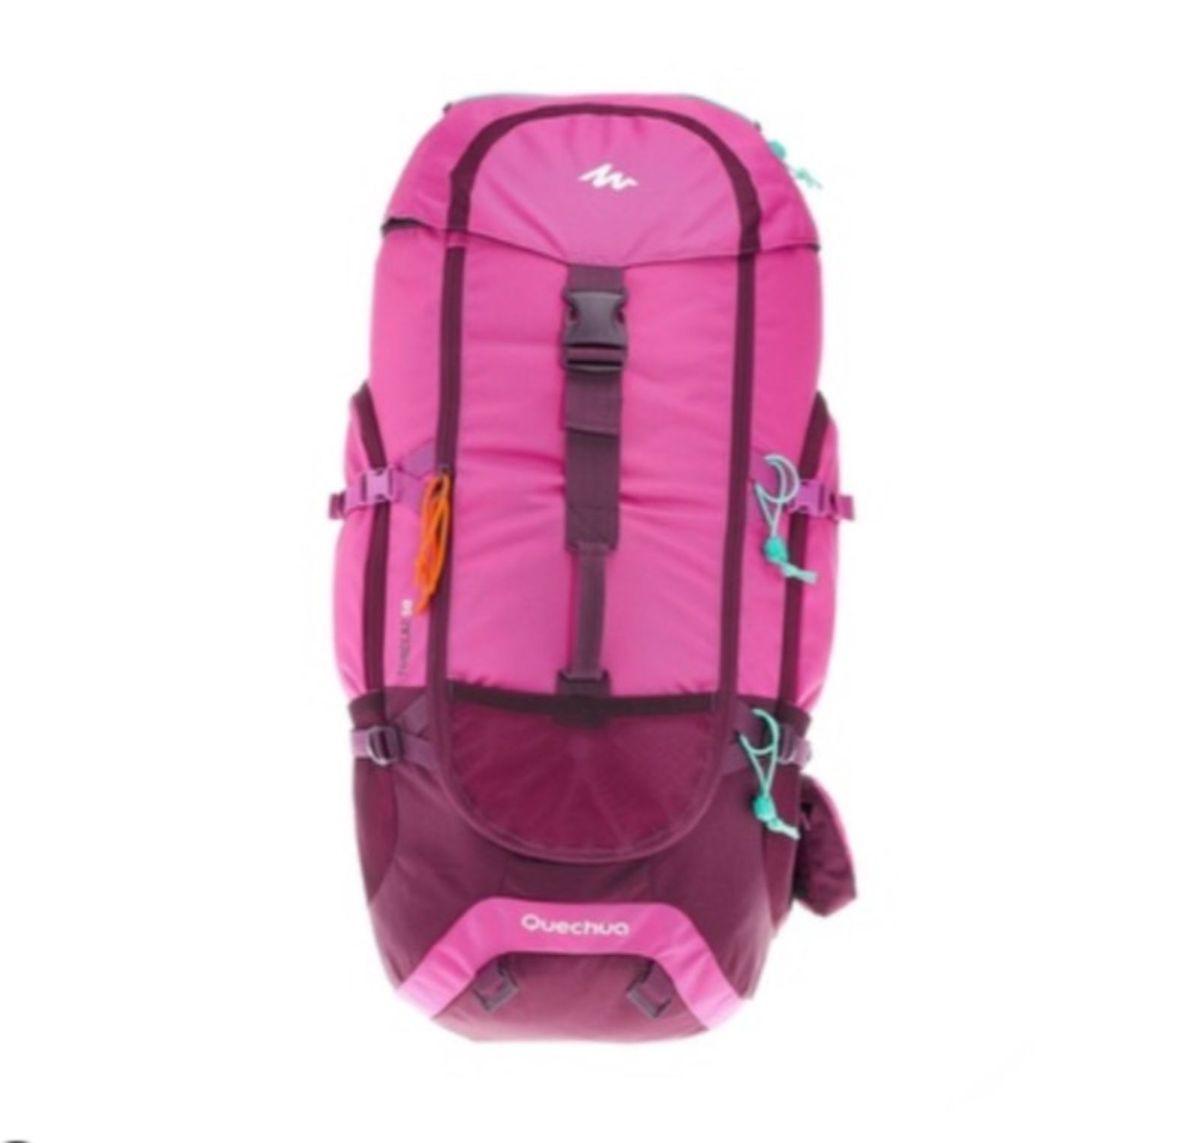 3c2850f2e mochila de trekking forclaz 50 litros feminina quechua - mochila quechua